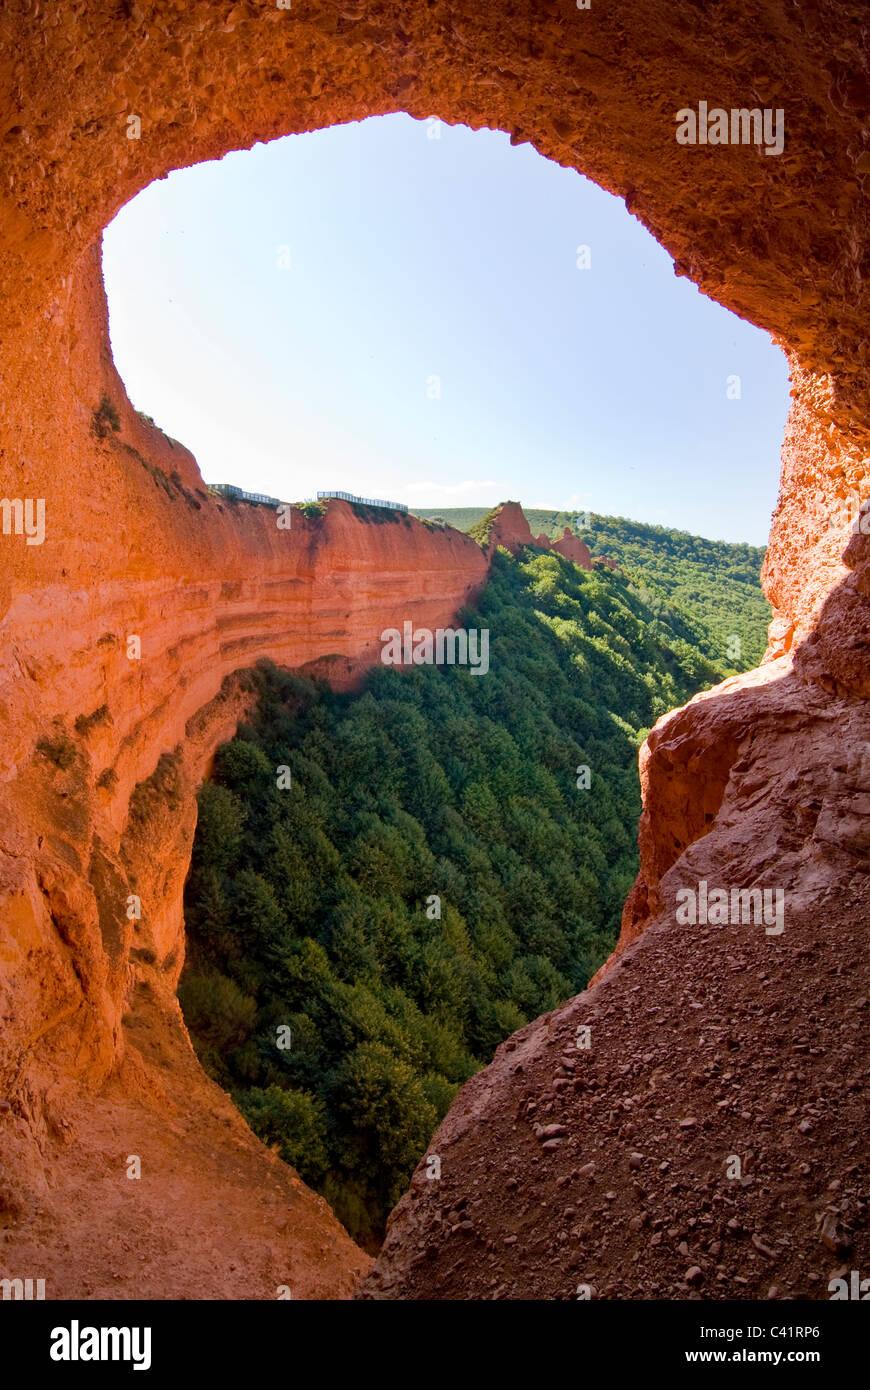 Las Médulas, Roman gold mine one of the UNESCO World Heritage Sites. - Stock Image